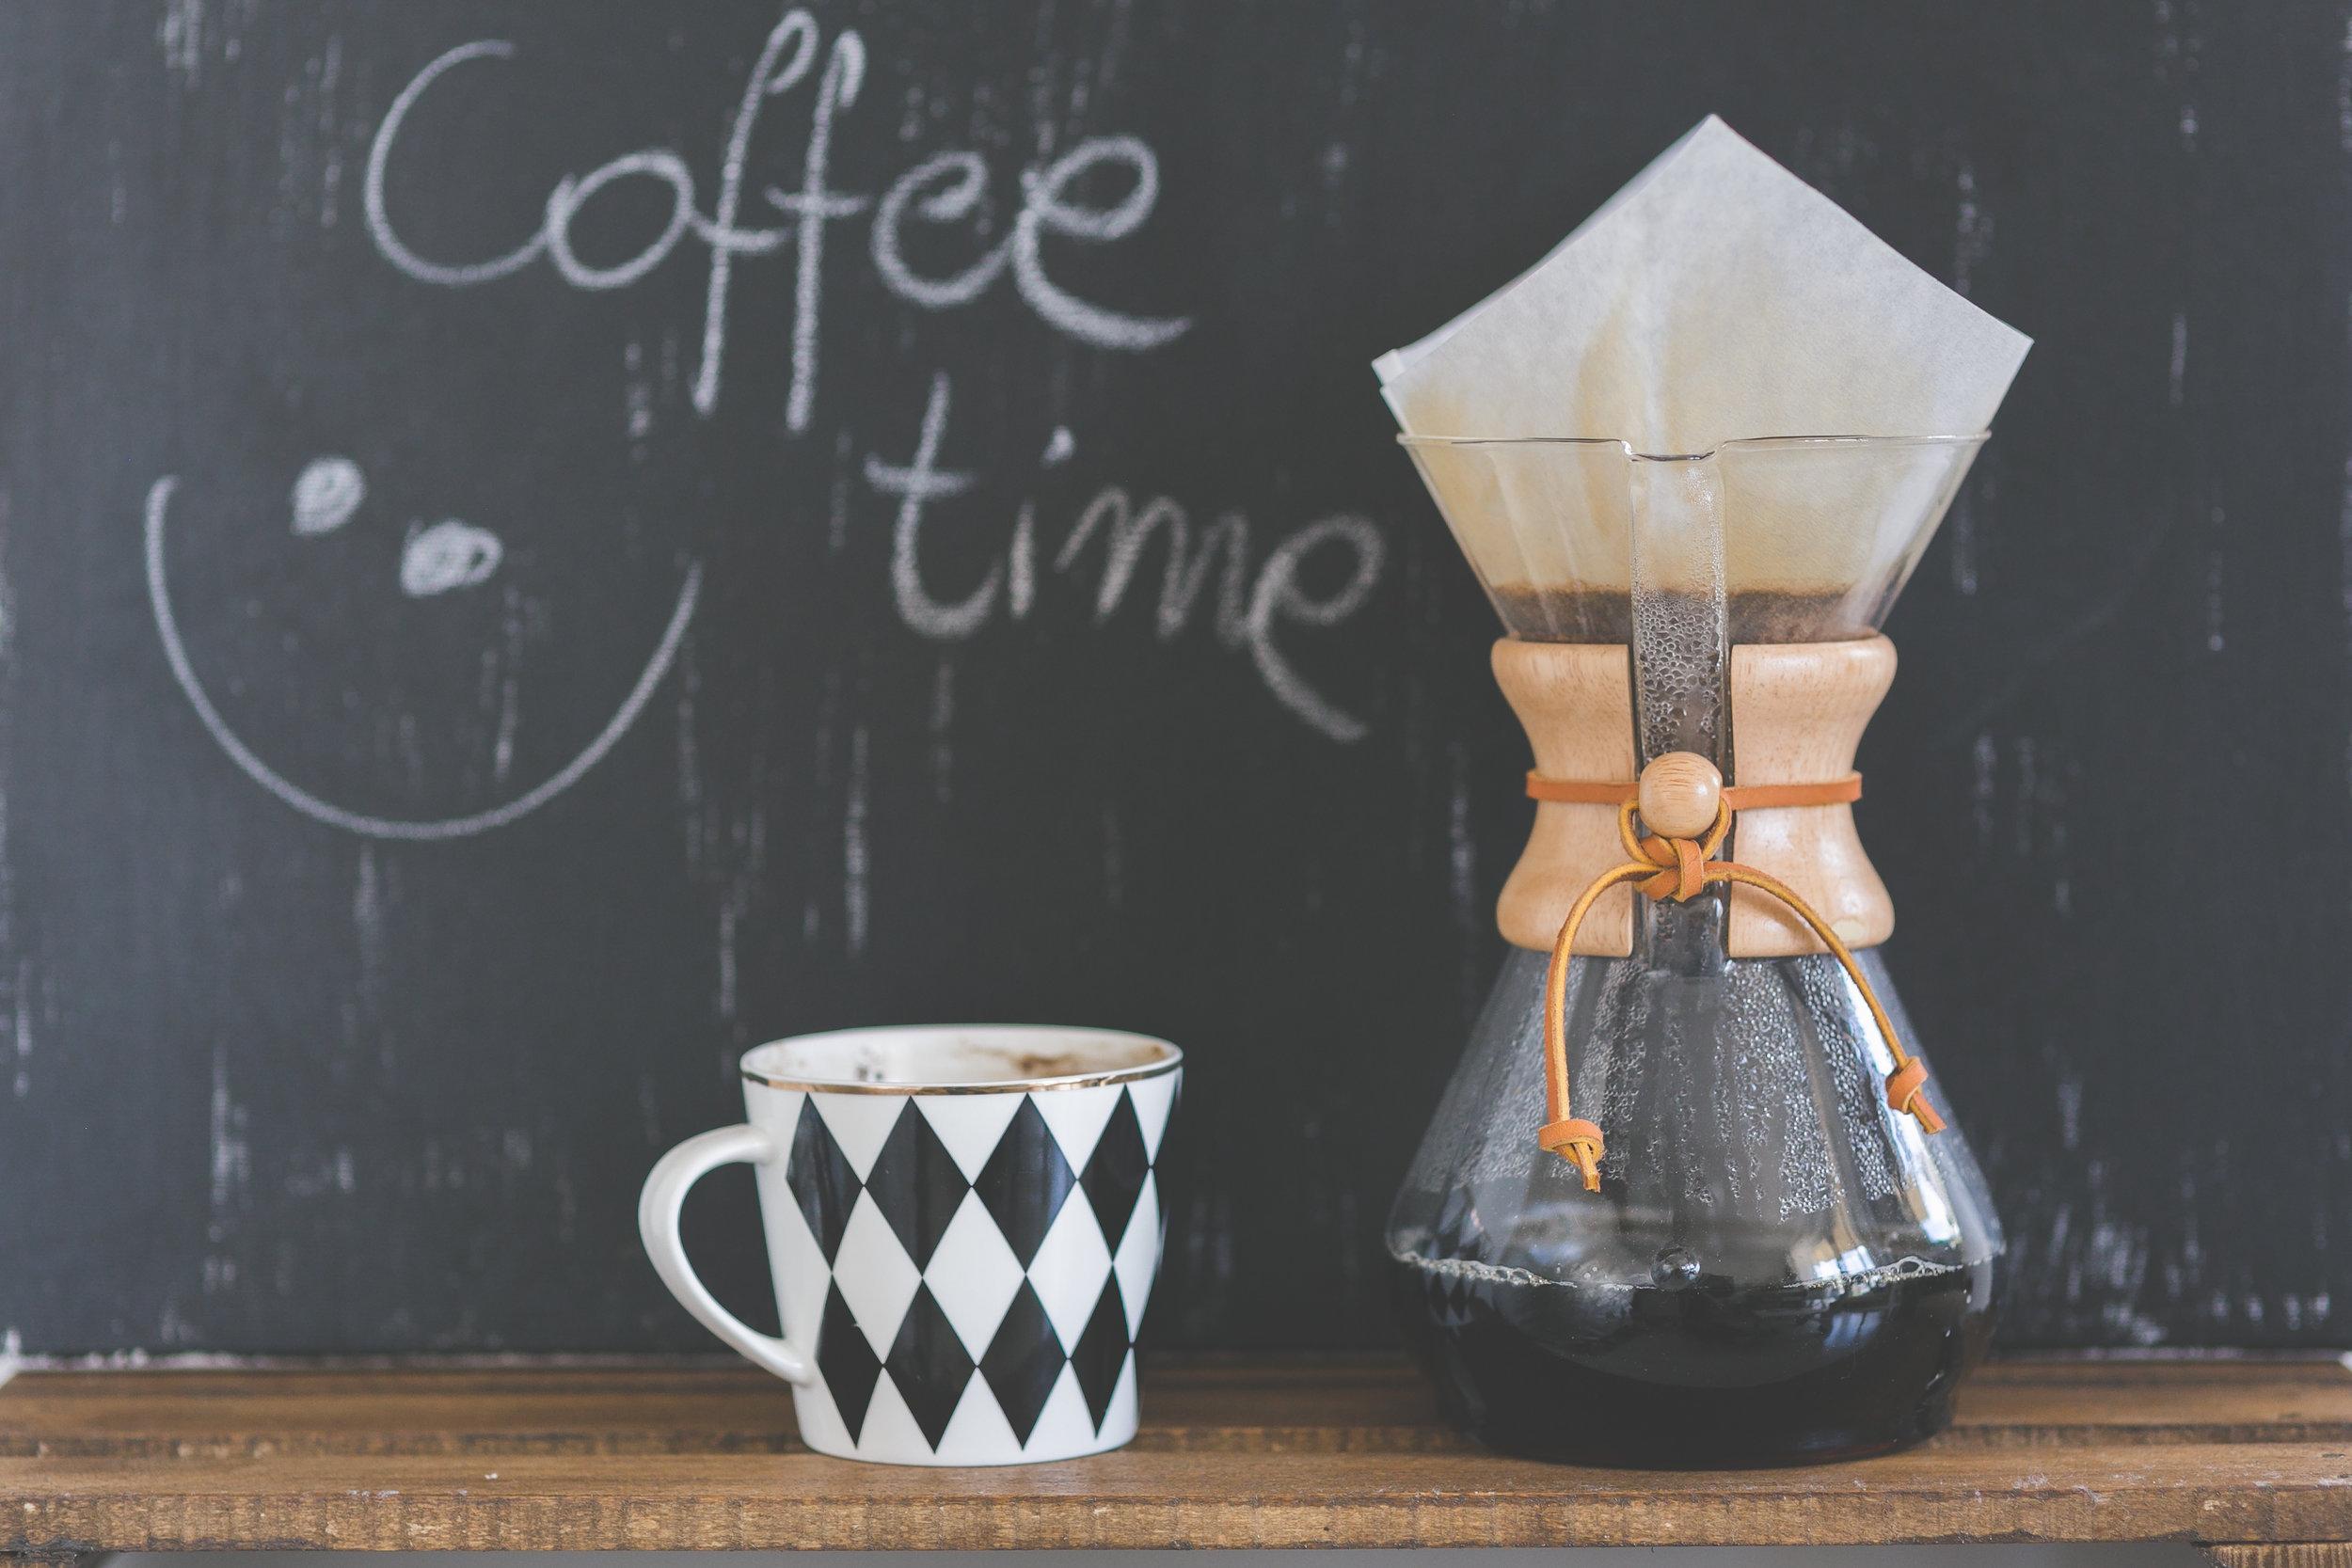 coffee-cup-mug-cafe.jpg